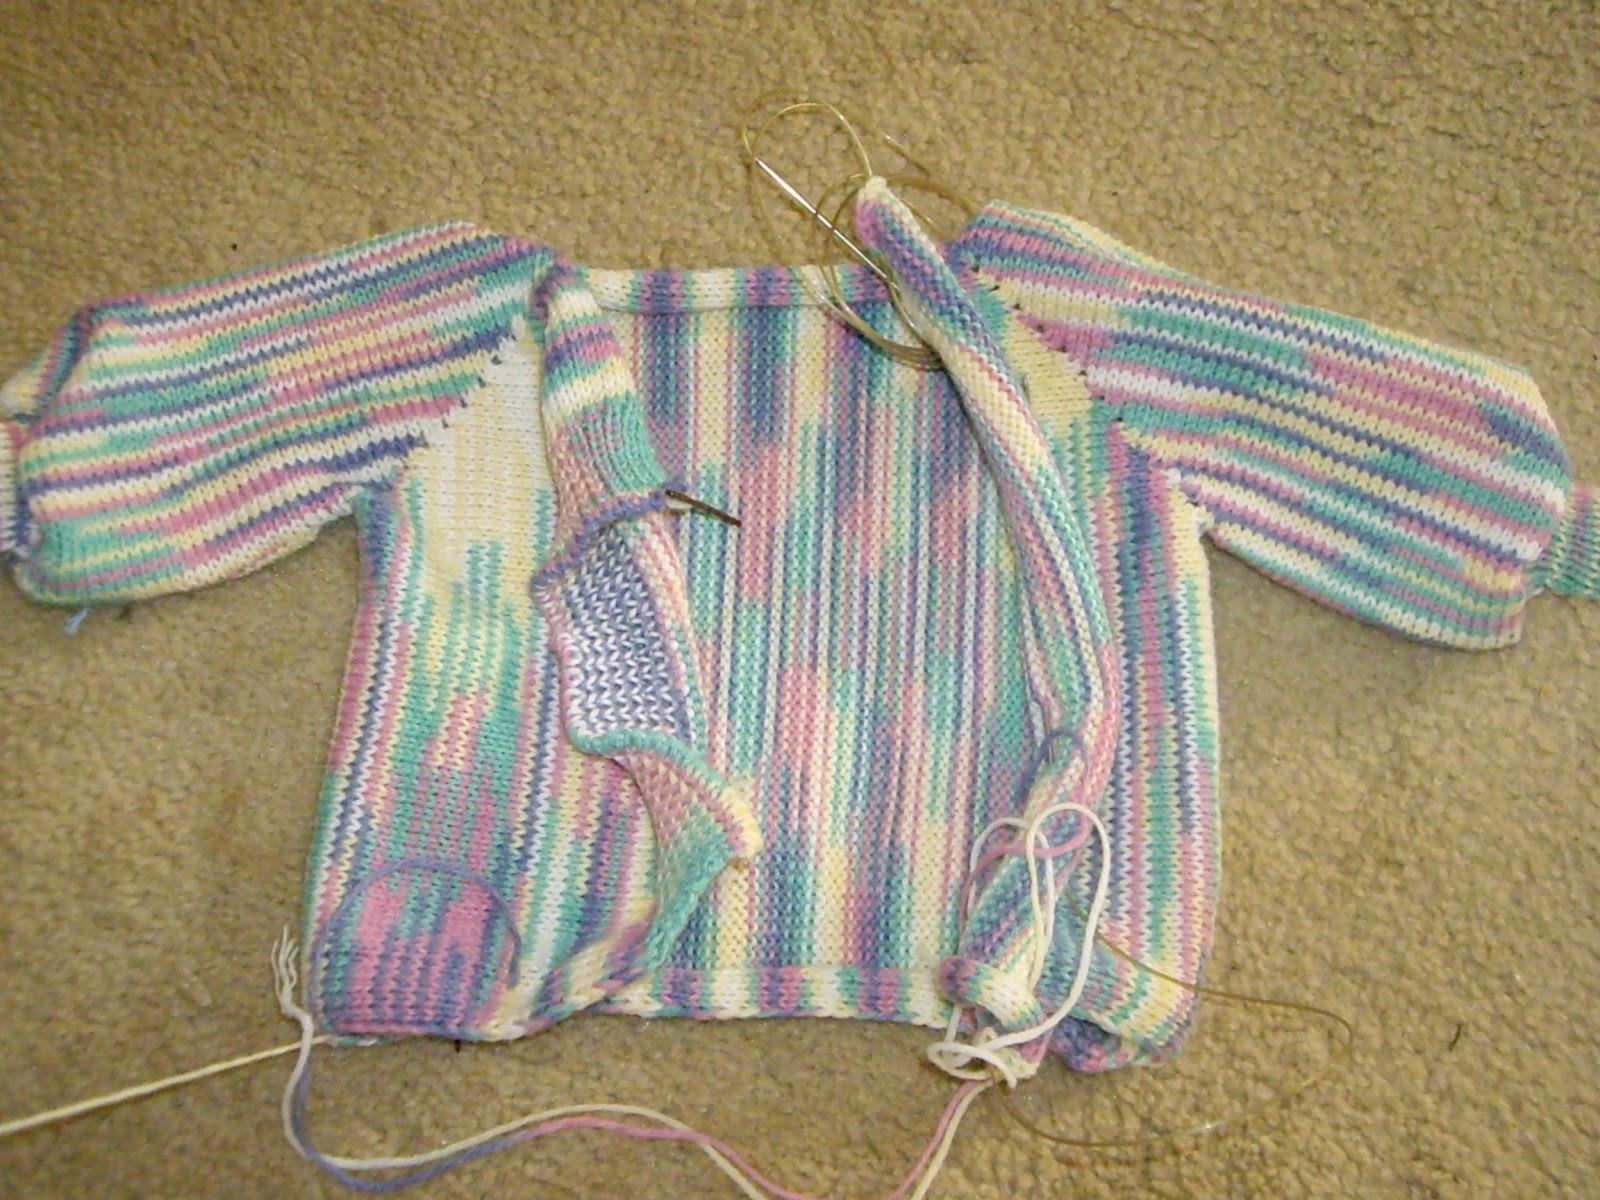 Knitting Olympics Ravelry : Ozlorna s knitting ravellenics aka the